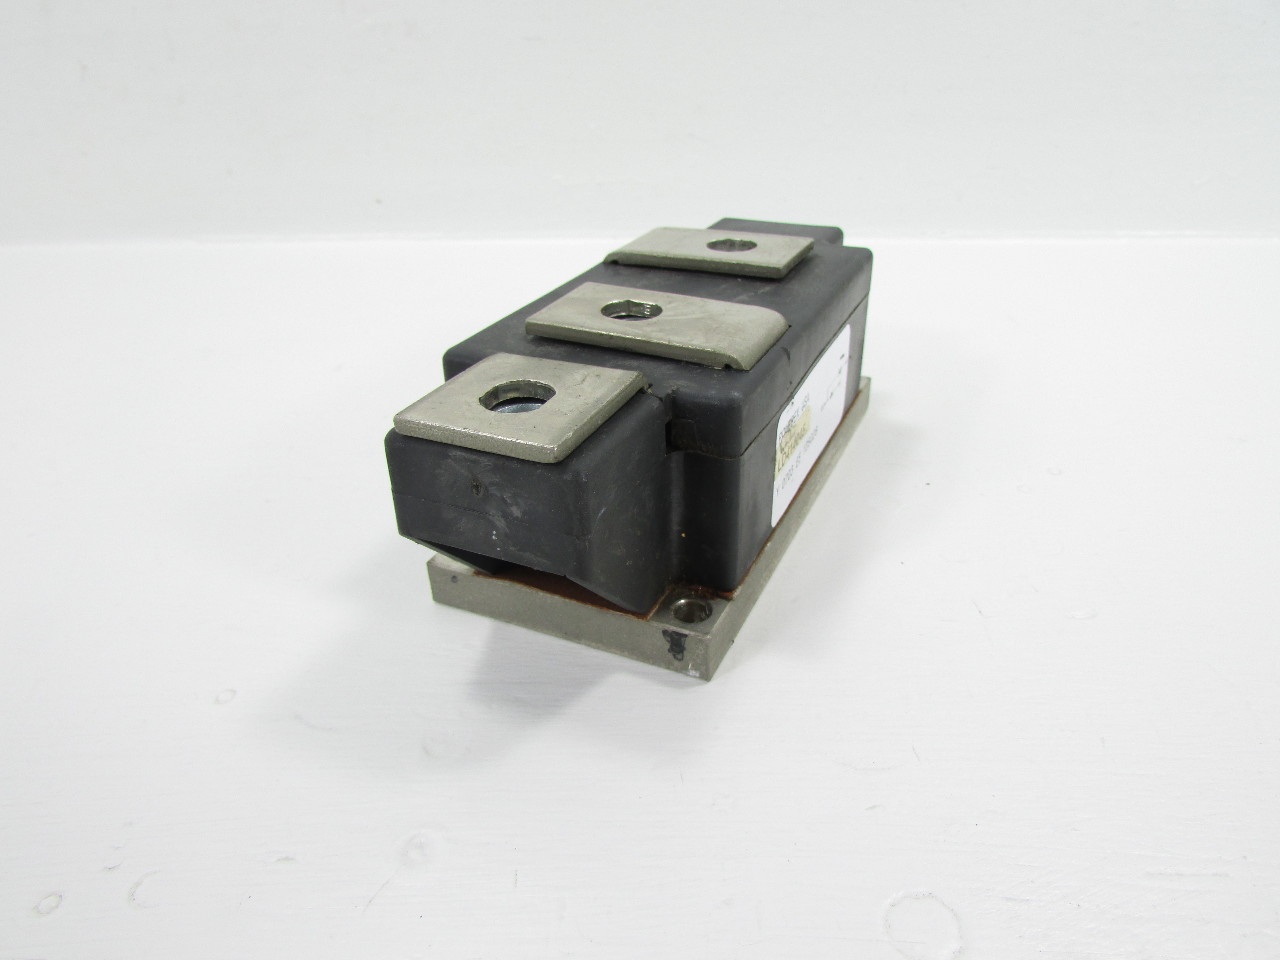 powerex usa ld414045 block module transistor premier. Black Bedroom Furniture Sets. Home Design Ideas